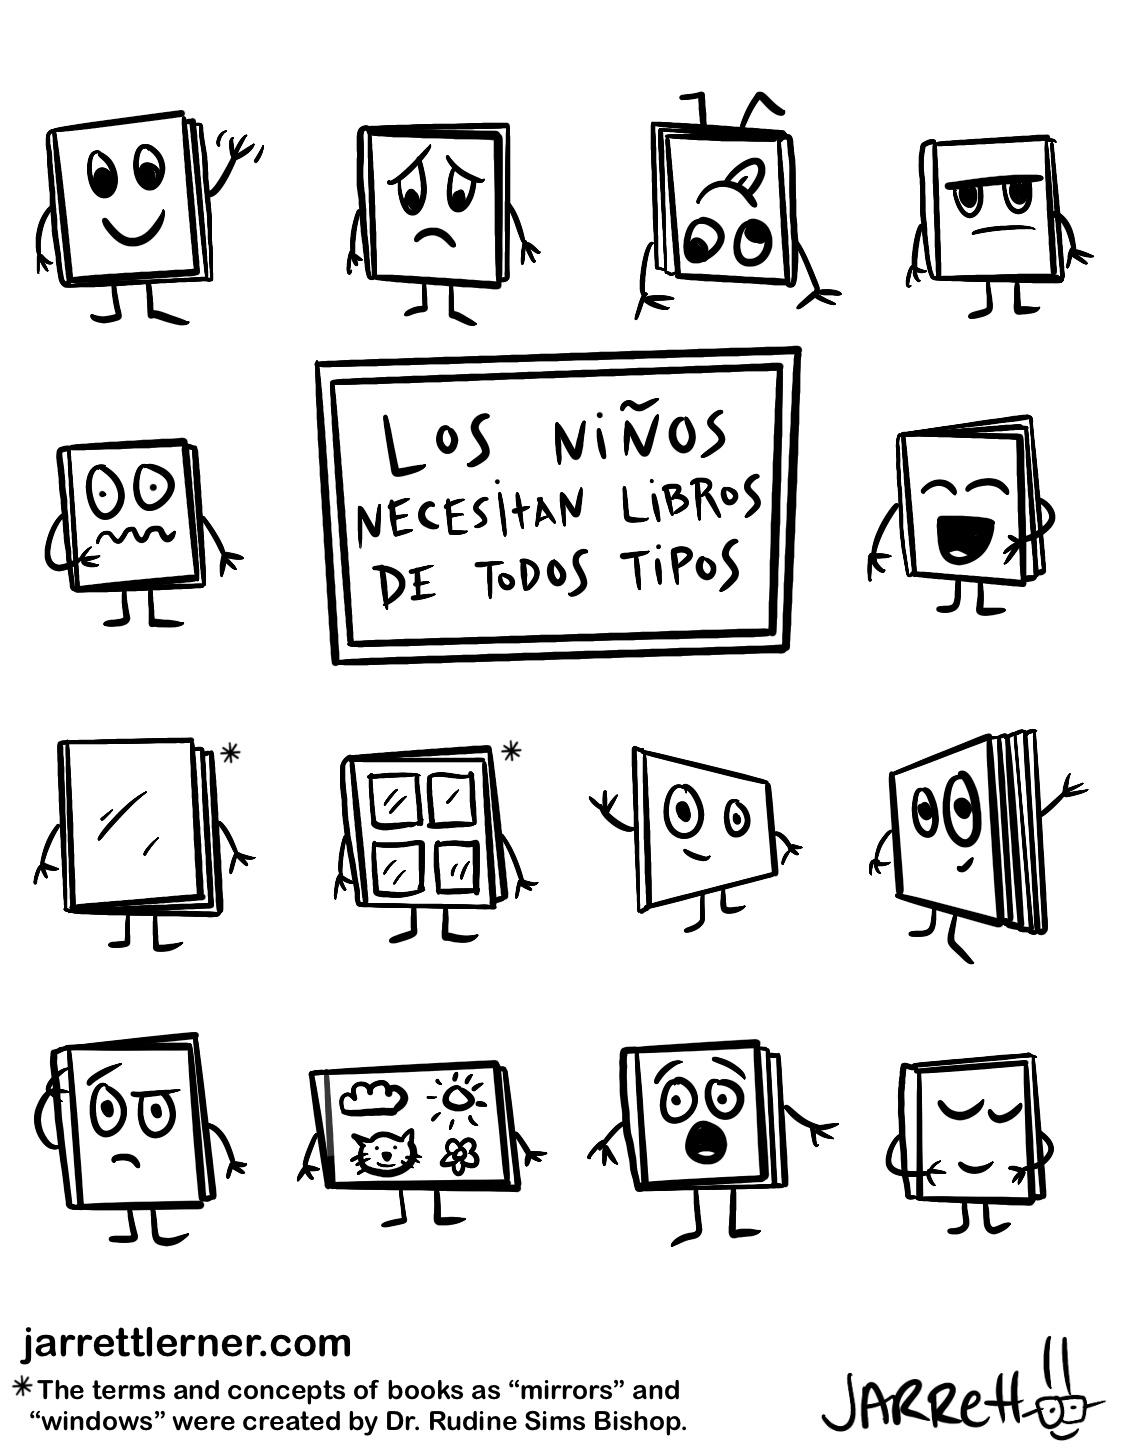 Kids Need Books of All Kinds_Spanish.jpg